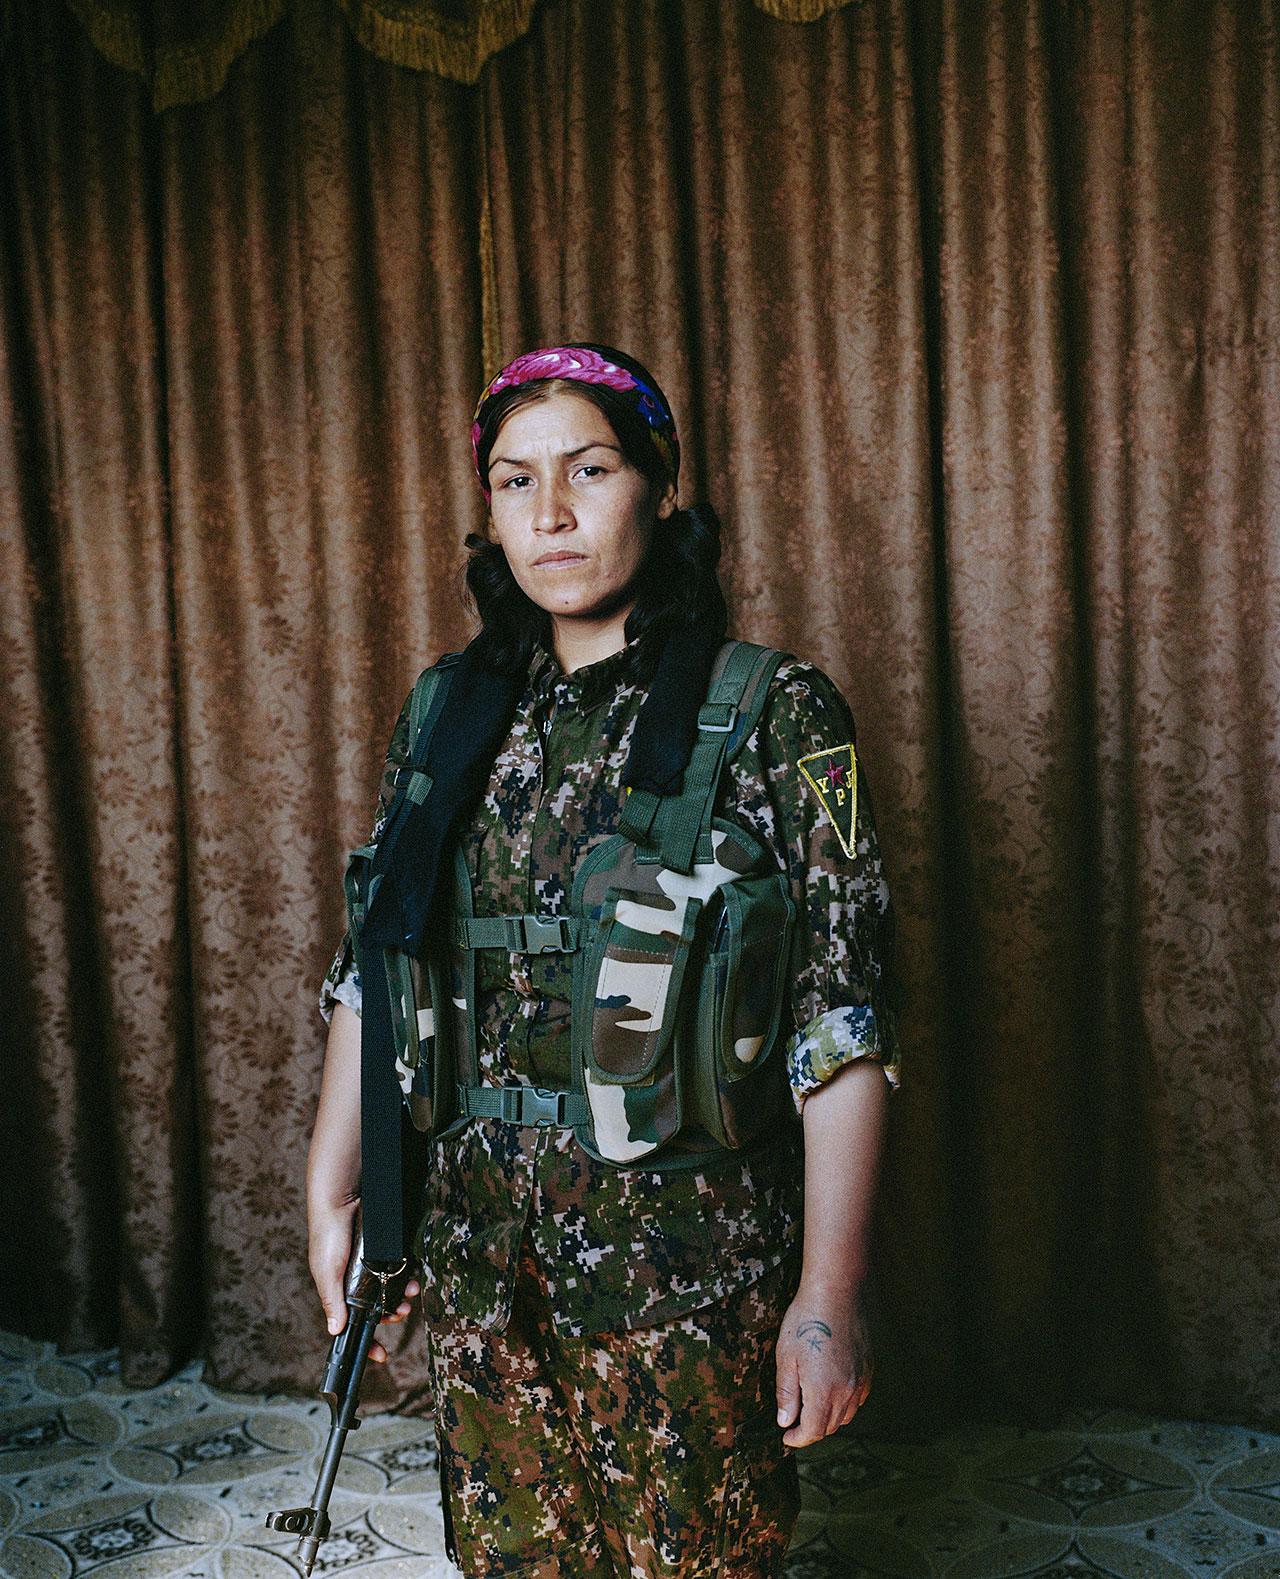 Sonja Hamad - »Jin – Jiyan – Azadi« Women, Life, Freedom. Die kurdischen Kämpferinnen. - Felix Schoeller Photoaward